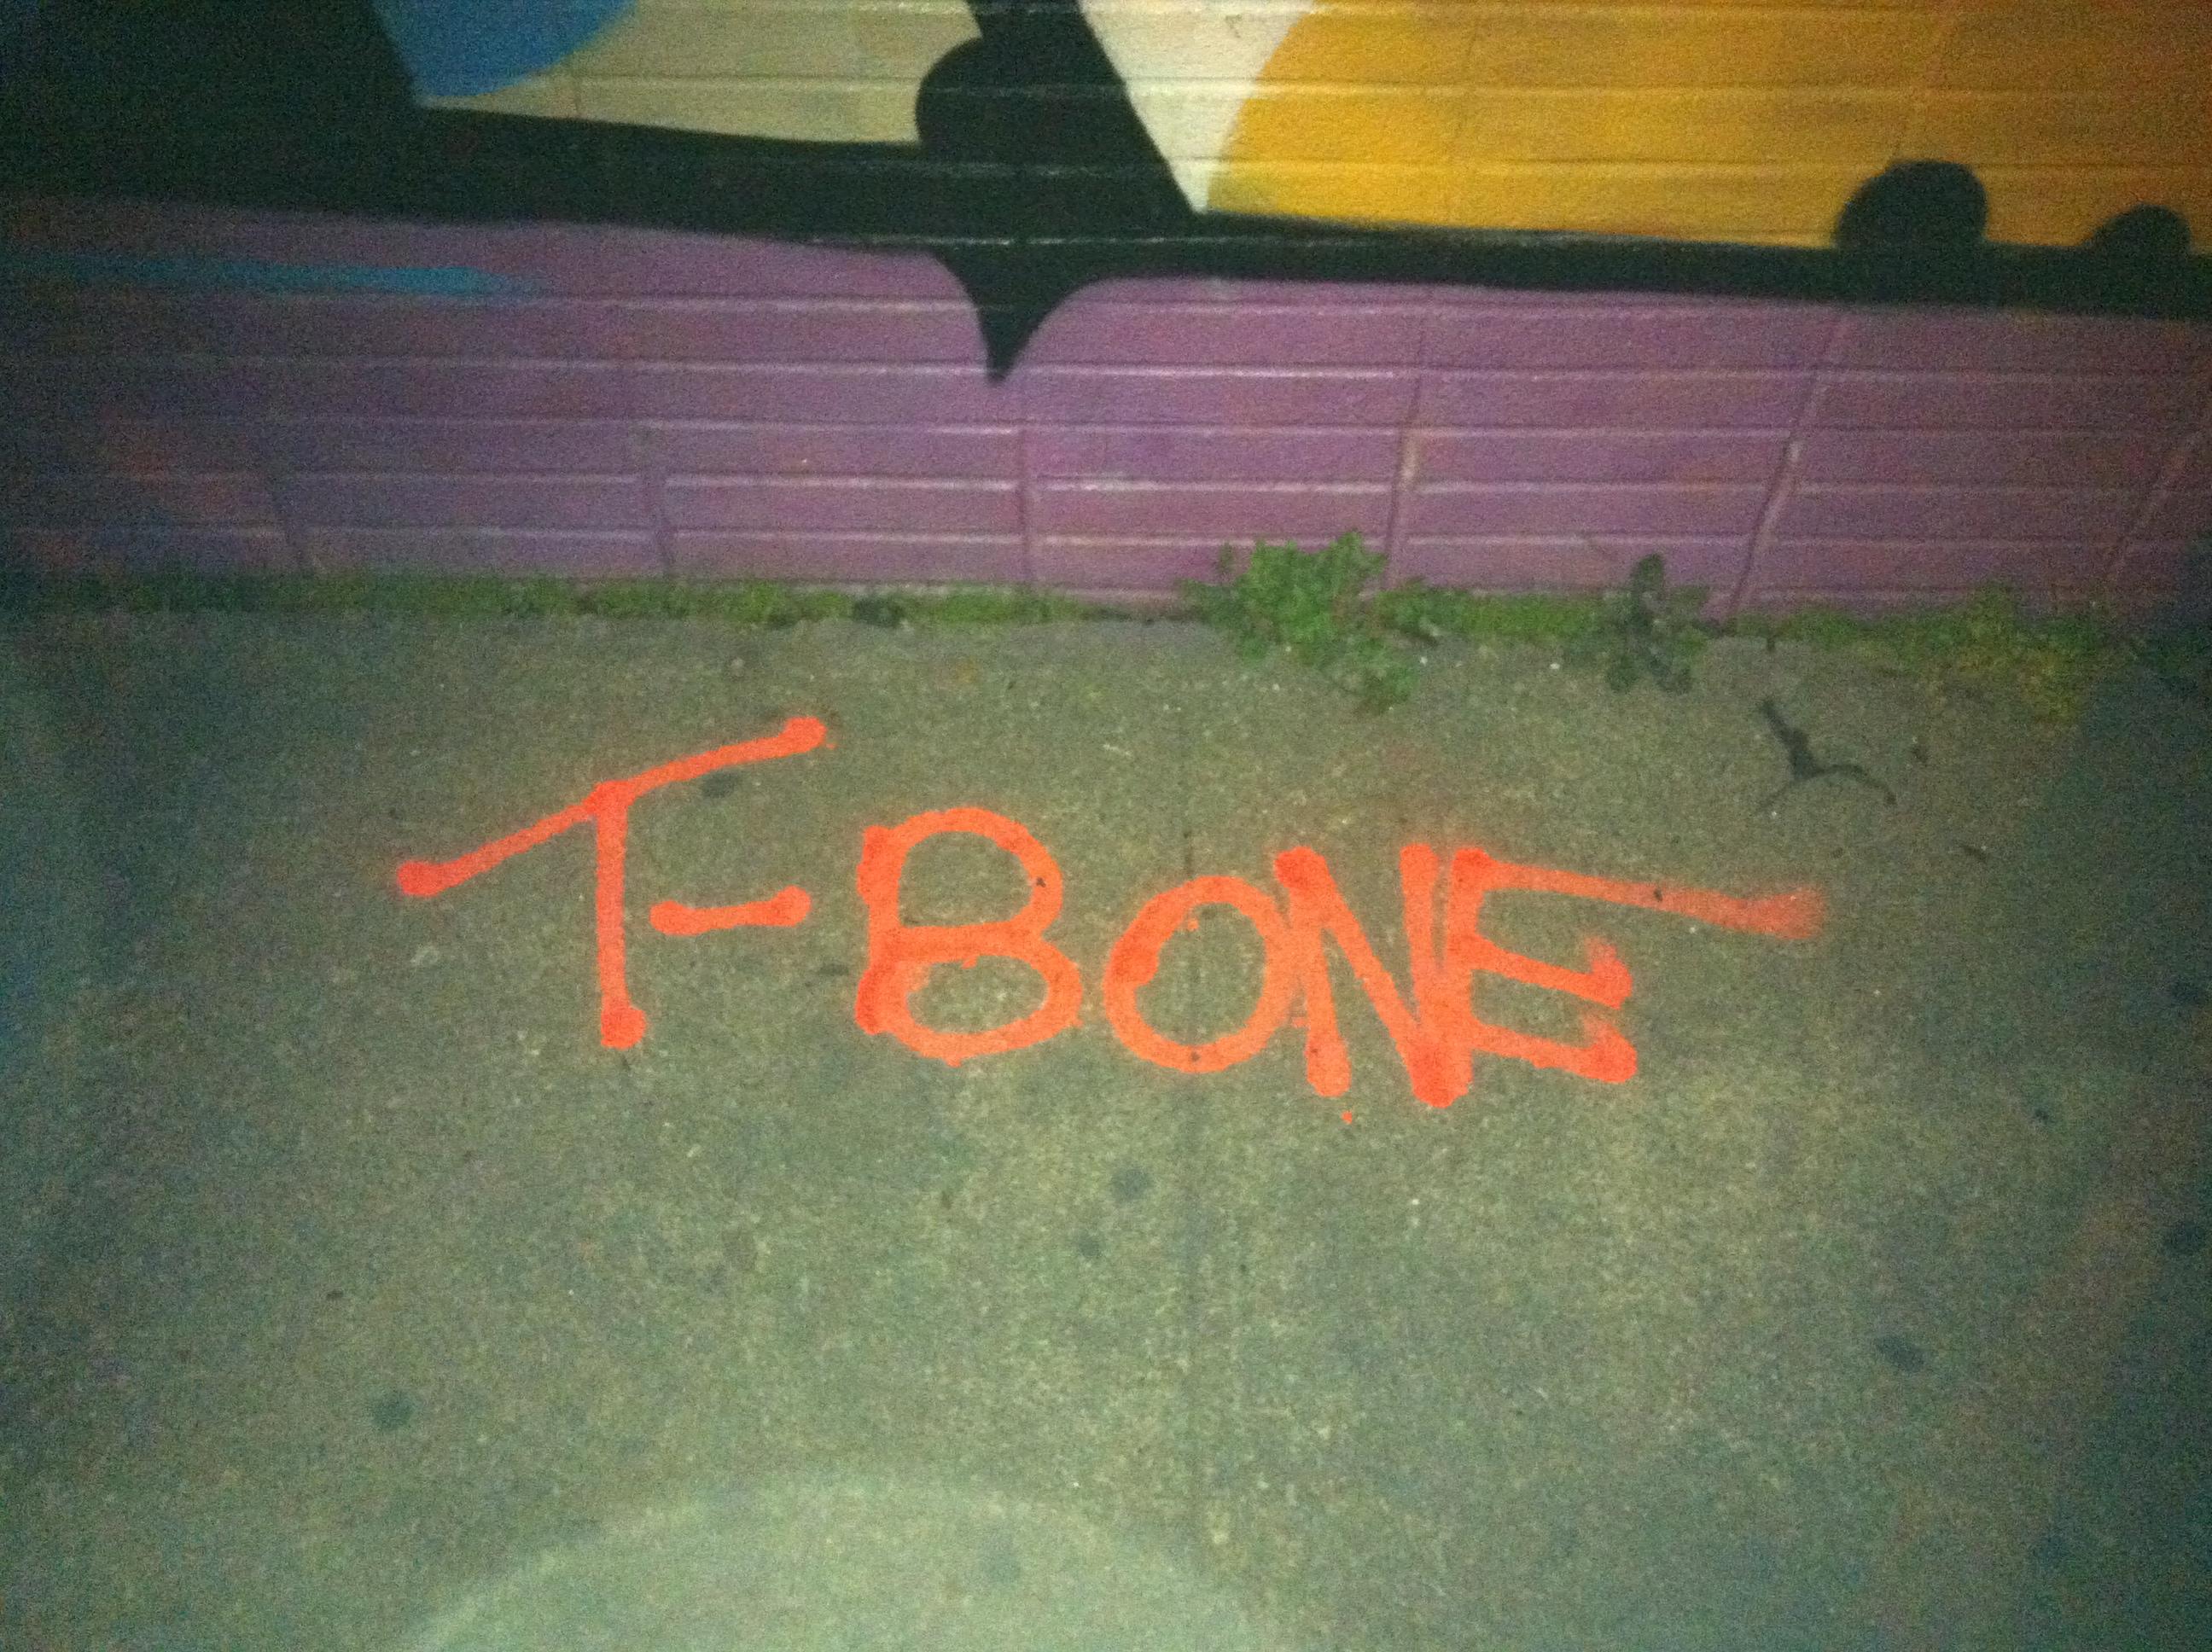 T-Bone Adams